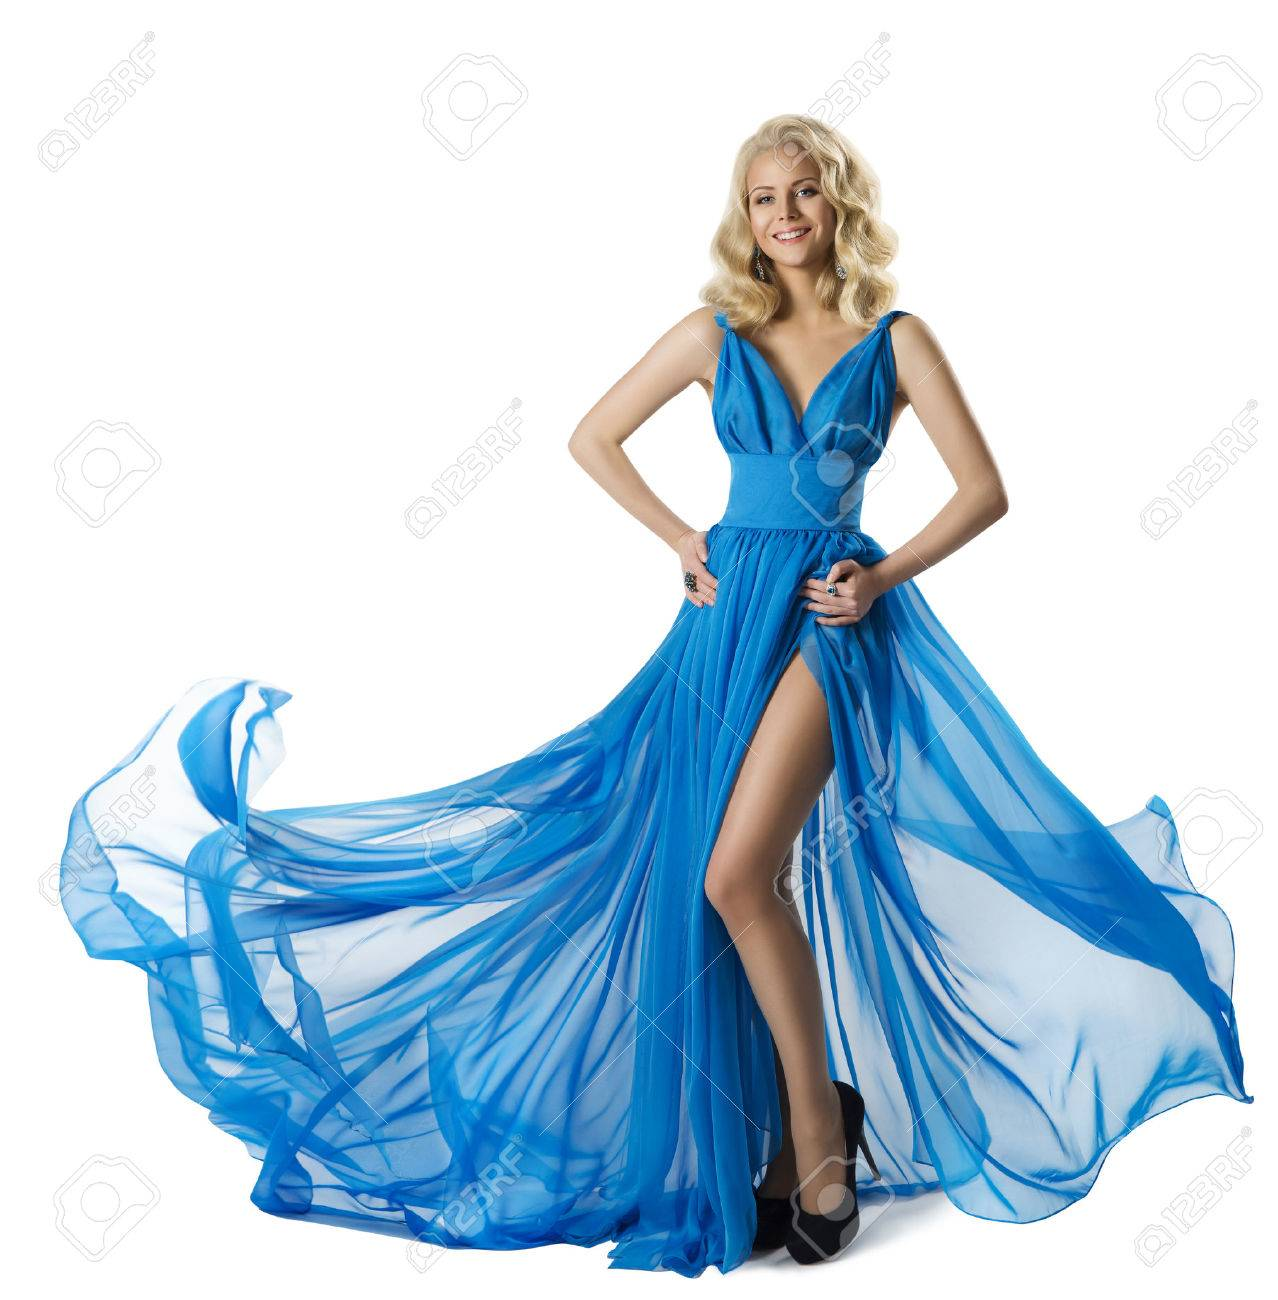 63d98a4ff2ea44 Stockfoto - Vrouw Fashion Blue Dress